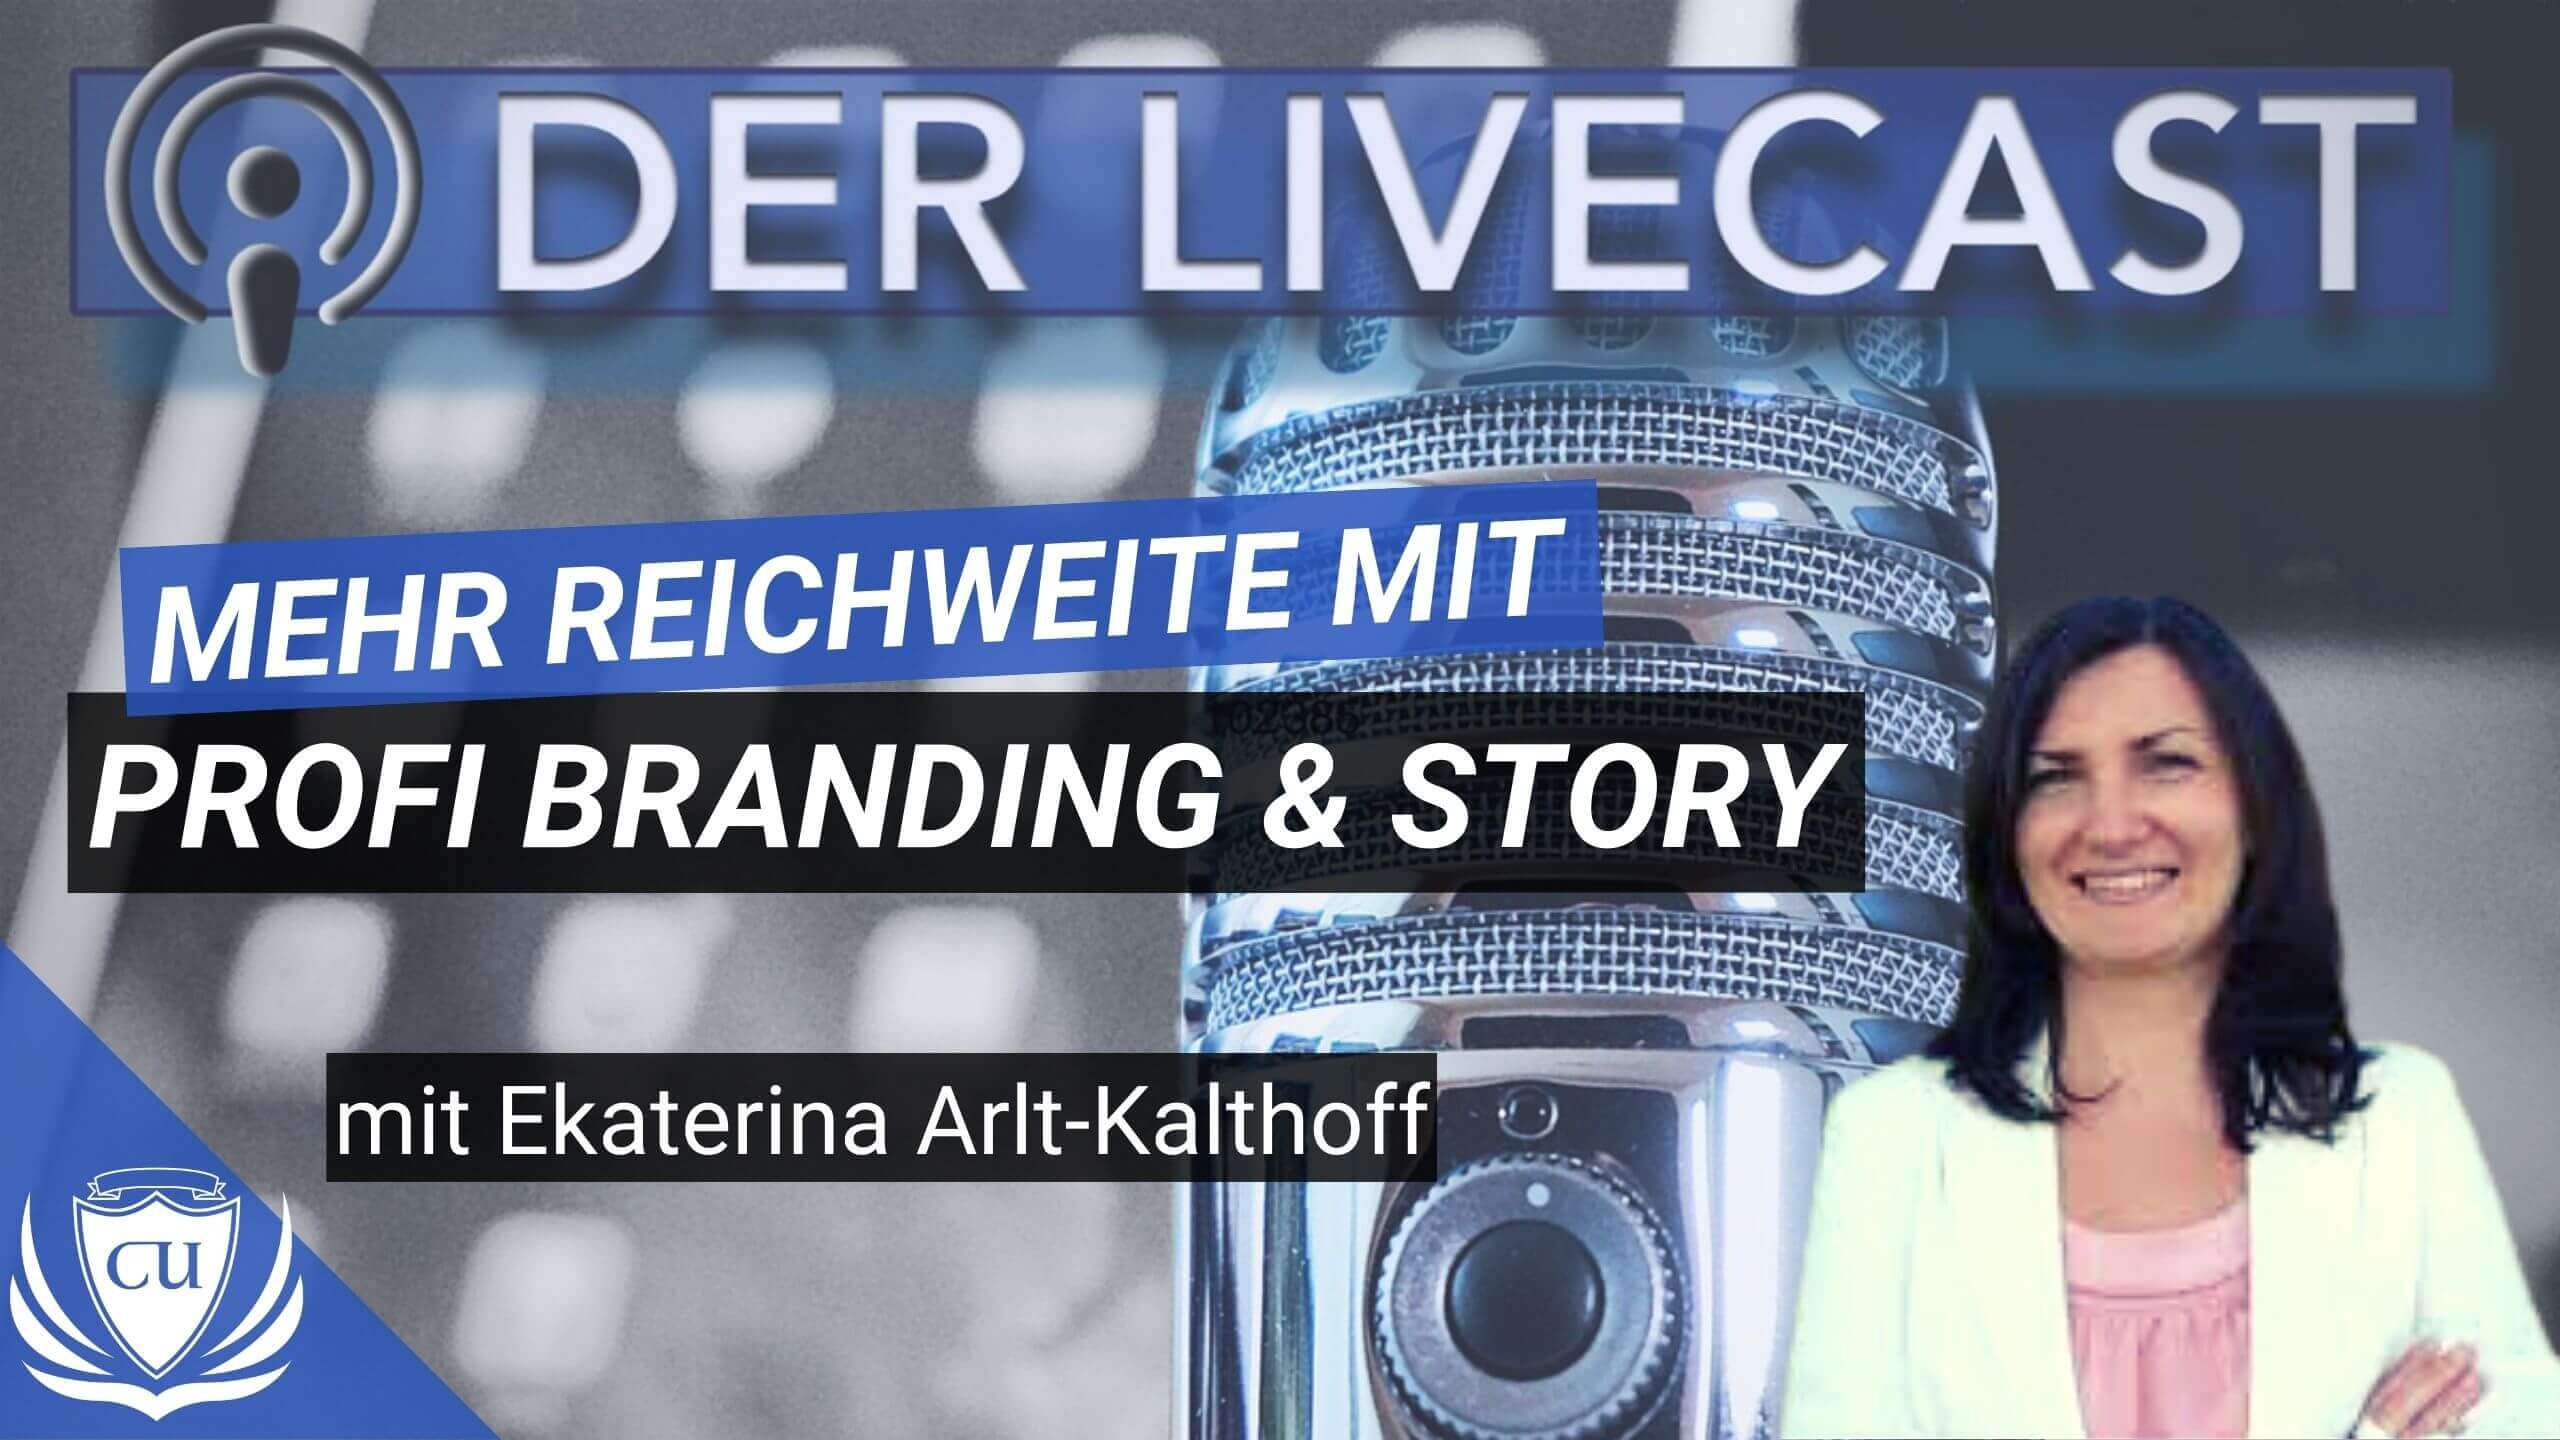 Profi-Branding und geniale Marketing Story entwickeln in die Presse kommst mit Ekaterina Arlt-Kalthoff-2